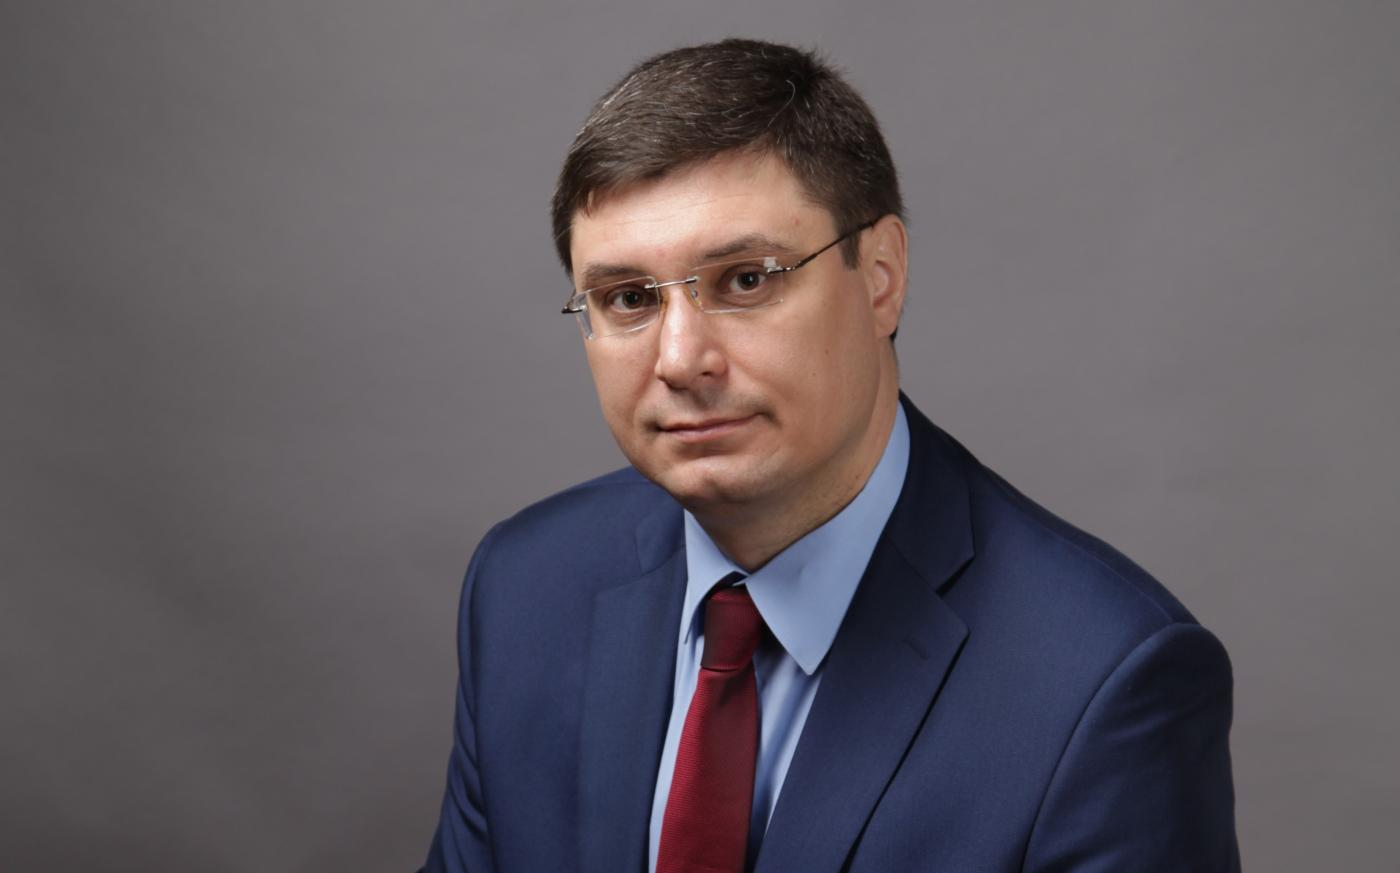 95956 86486 - Авдеев Александр Александрович